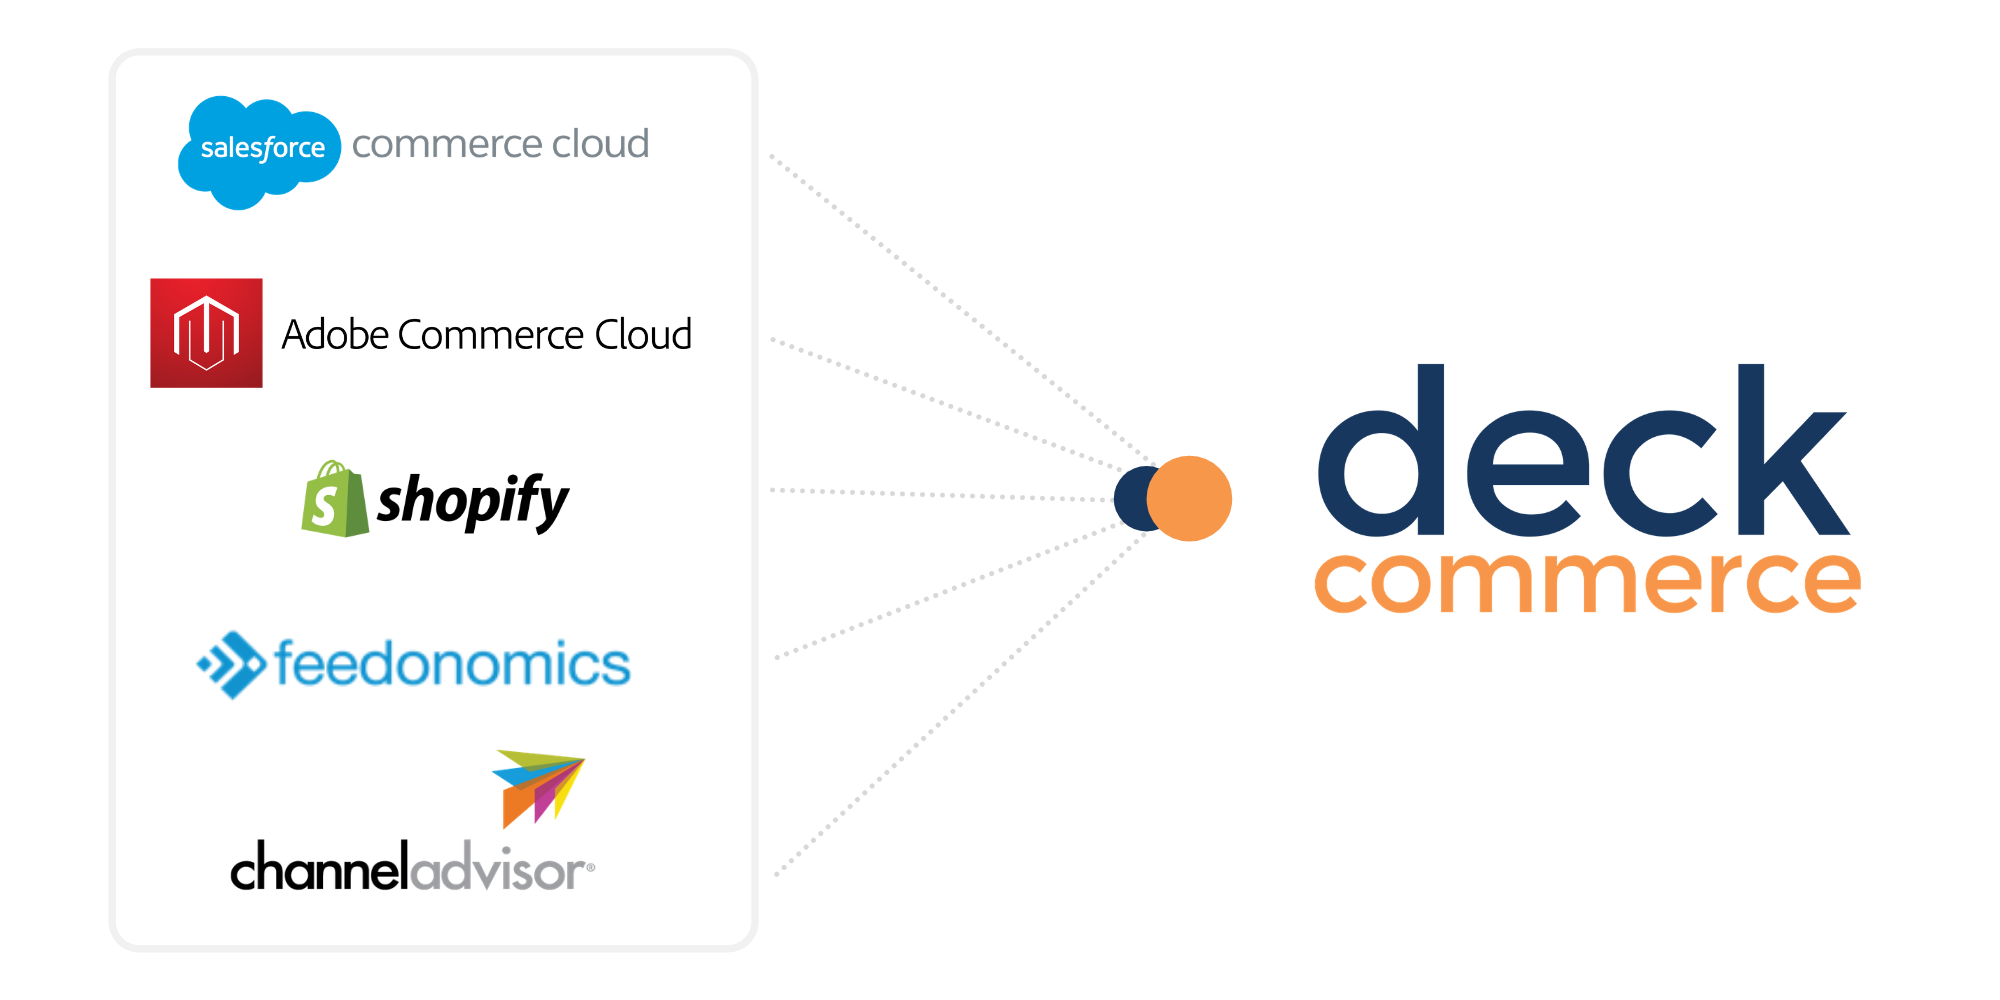 Shopify + SFCC + Adobe + Deck Commerce